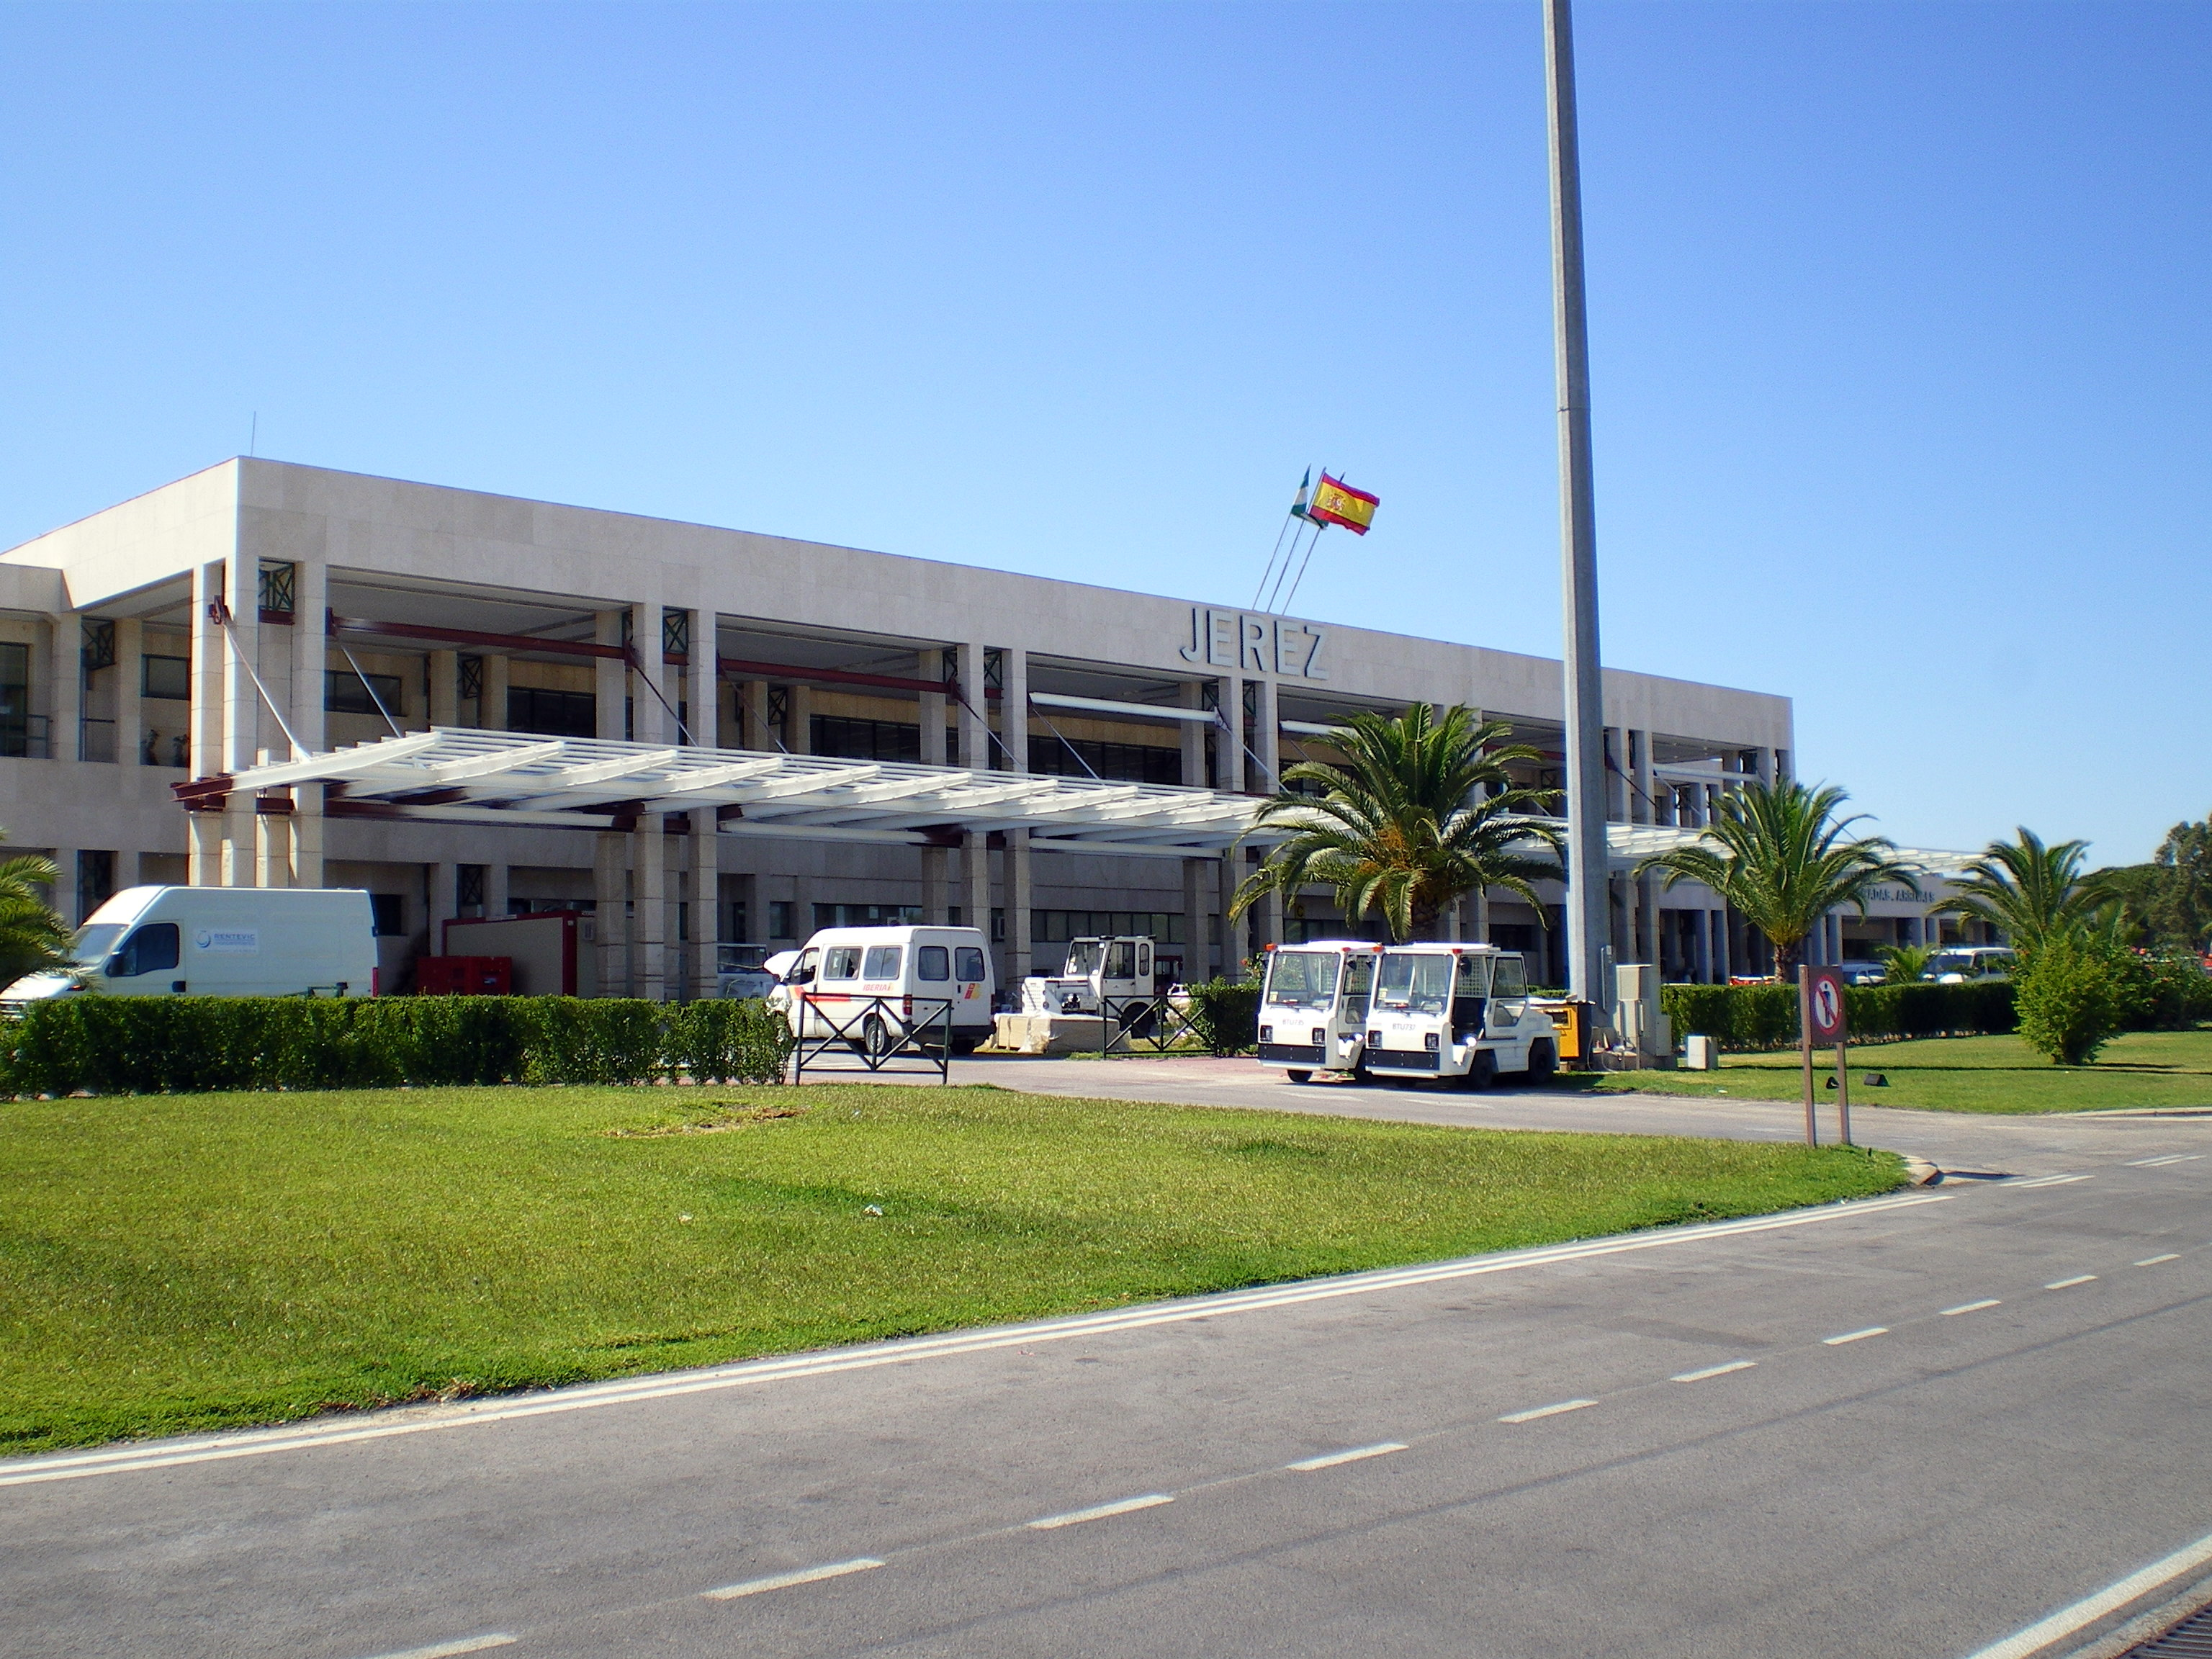 Aeropuerto de Jerez - Wikipedia, la enciclopedia libre